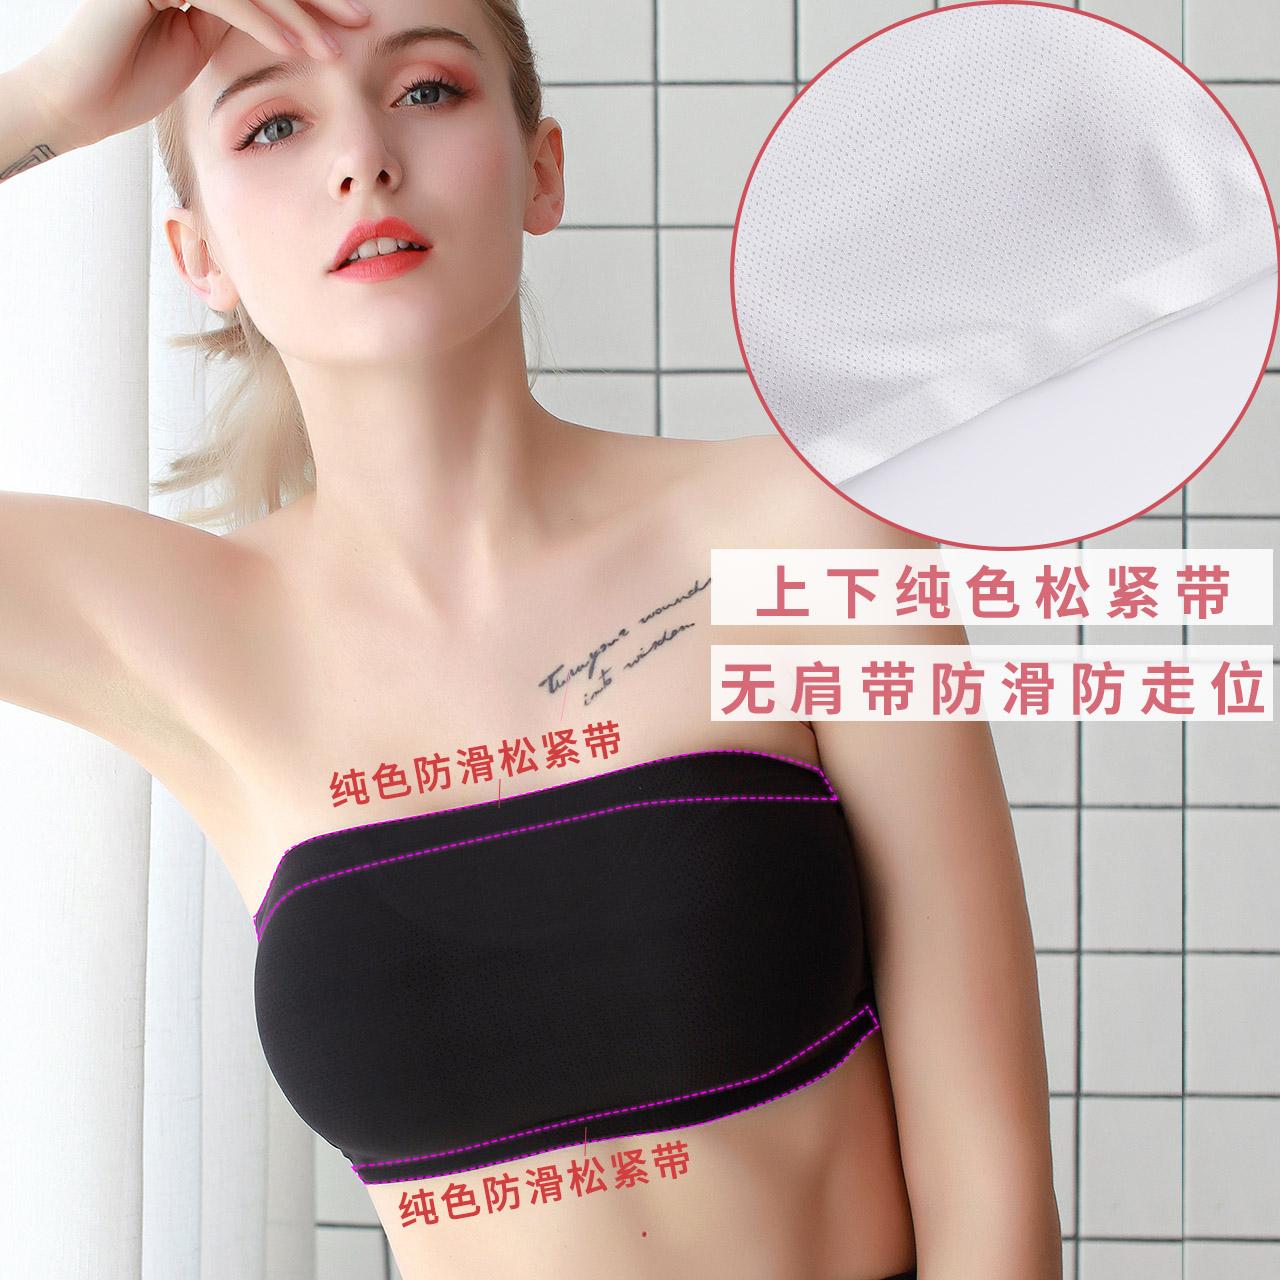 4336f27114b7 Ice silk strapless bra underwear bra top anti-light gather wrapped chest  style take the · Zoom · lightbox moreview · lightbox moreview · lightbox  moreview ...